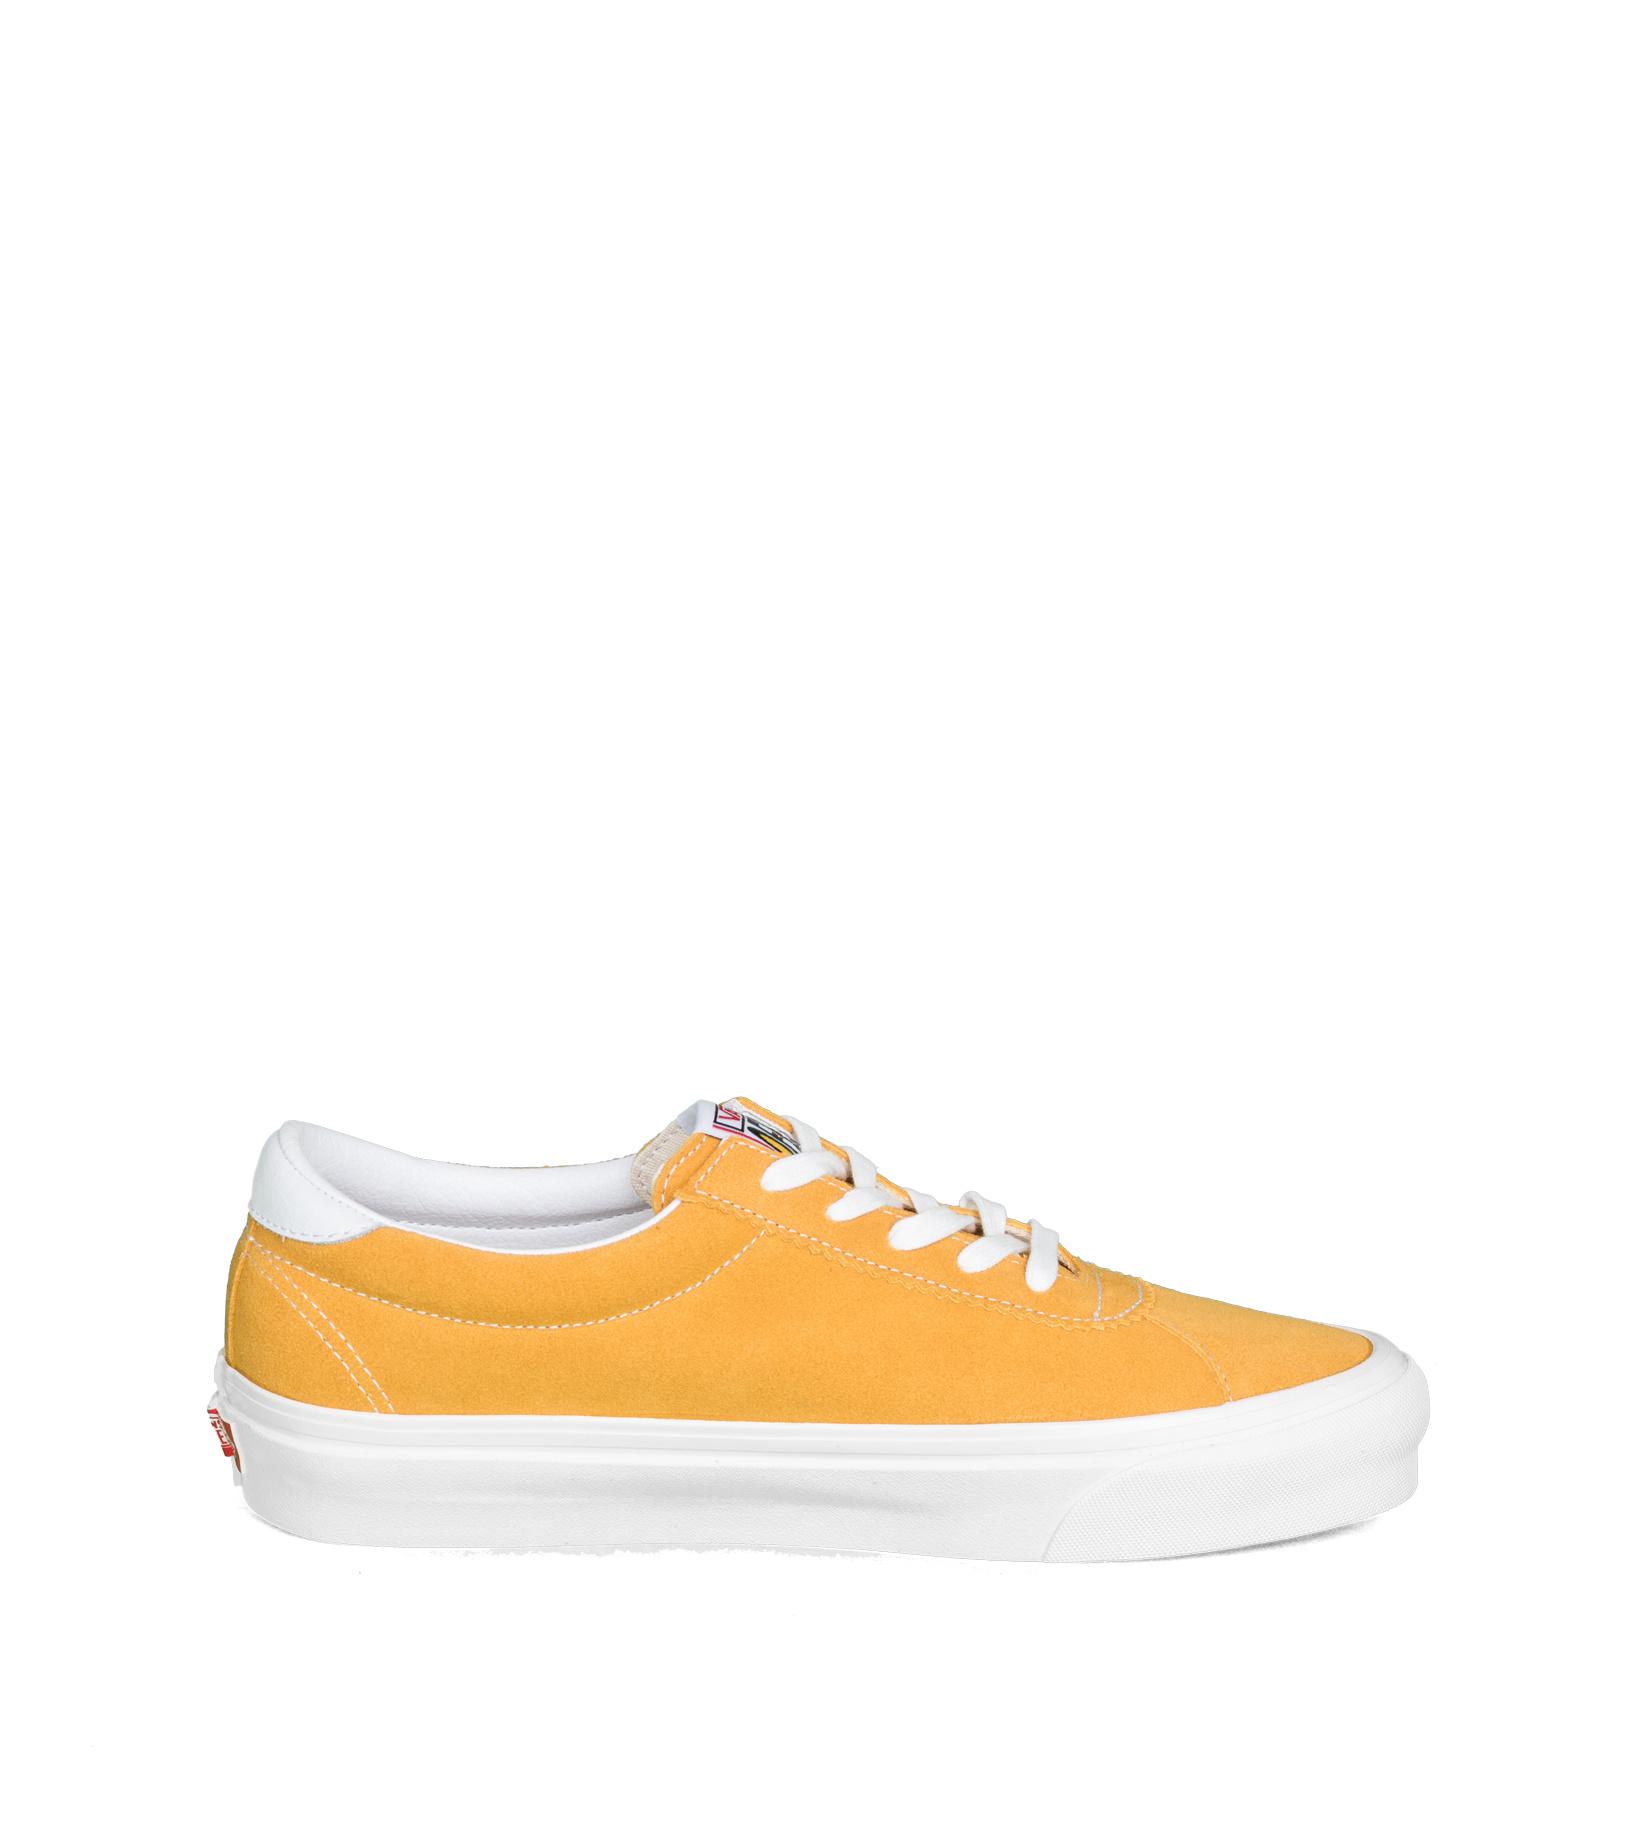 "Style 73 DX (Anaheim Factory) ""OG Saffron""-4"